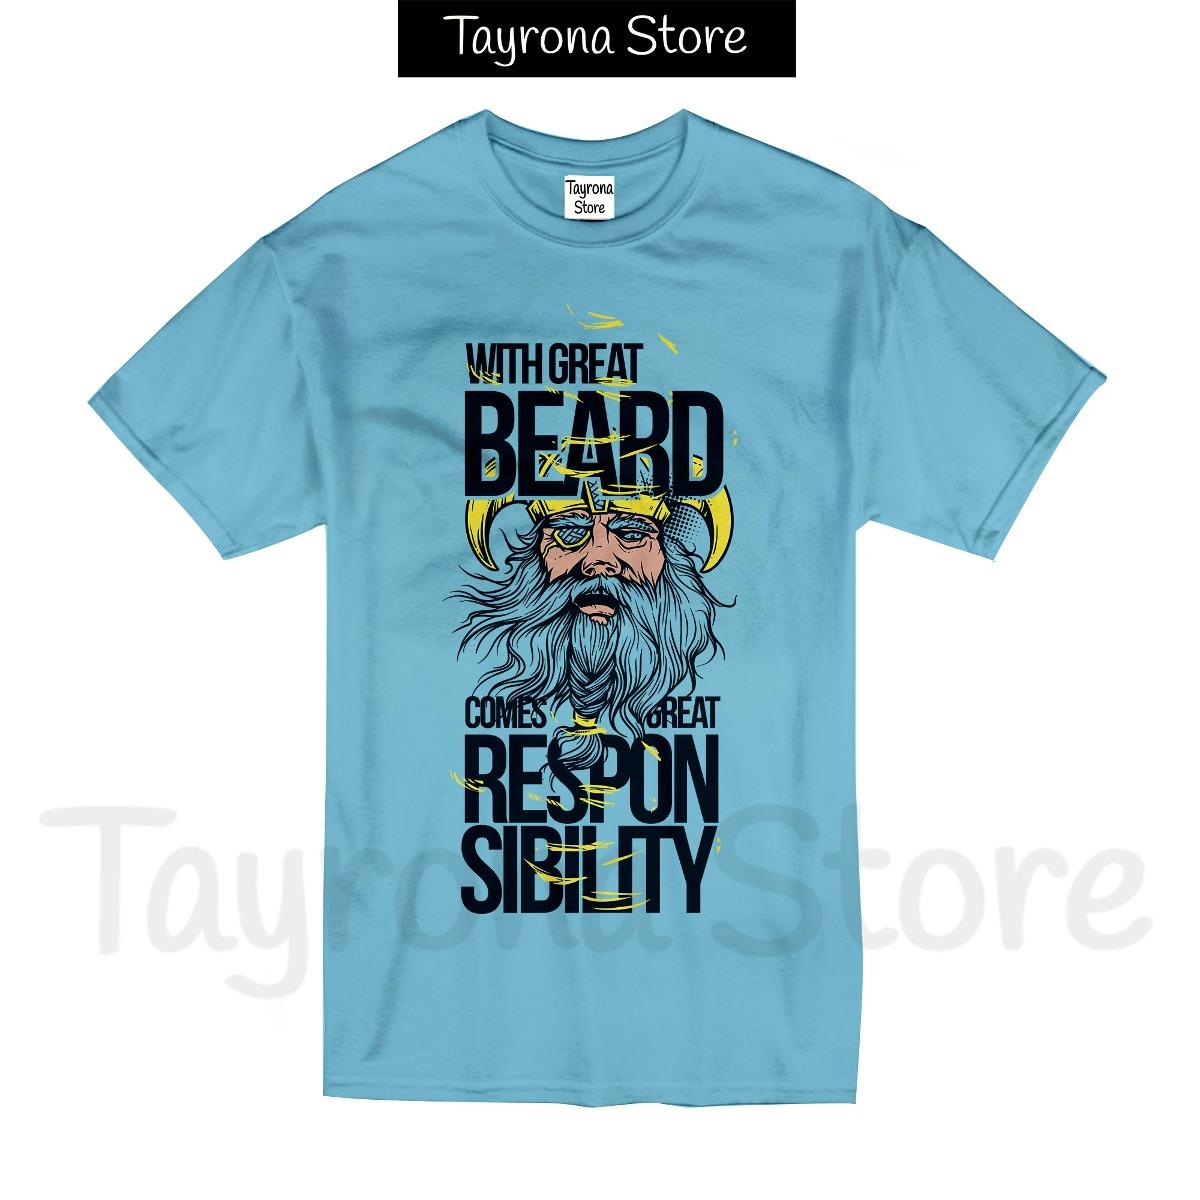 Camisetas Barba Con Vikingo Loco Store 0339 En 700 Tayrona yb7fg6